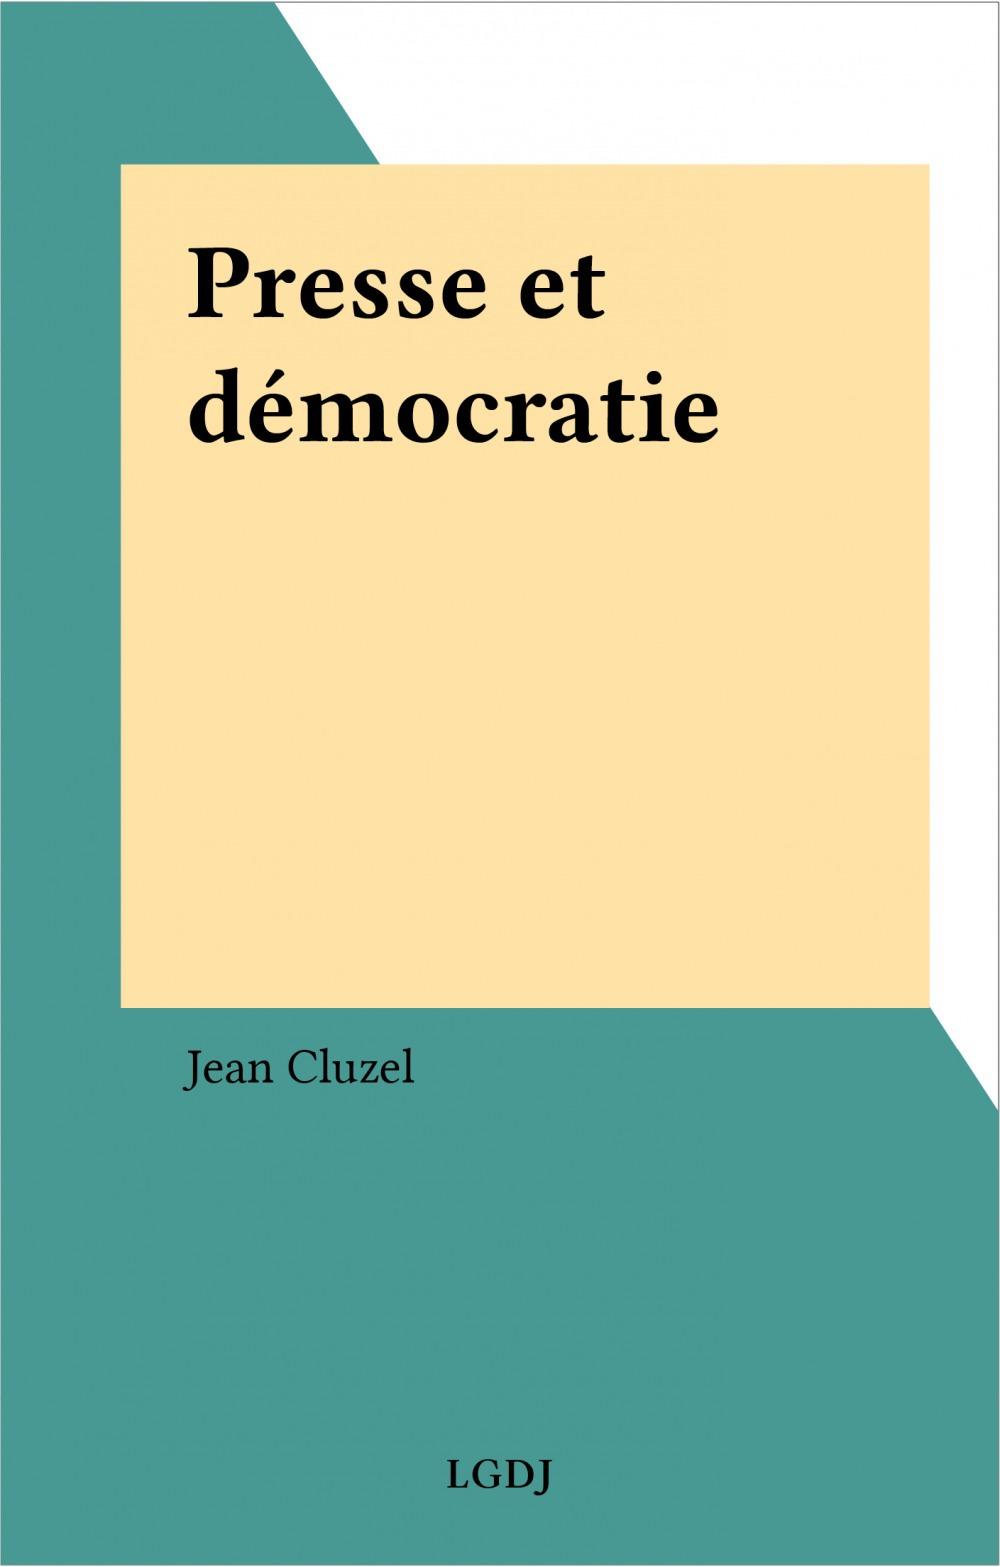 Presse et démocratie